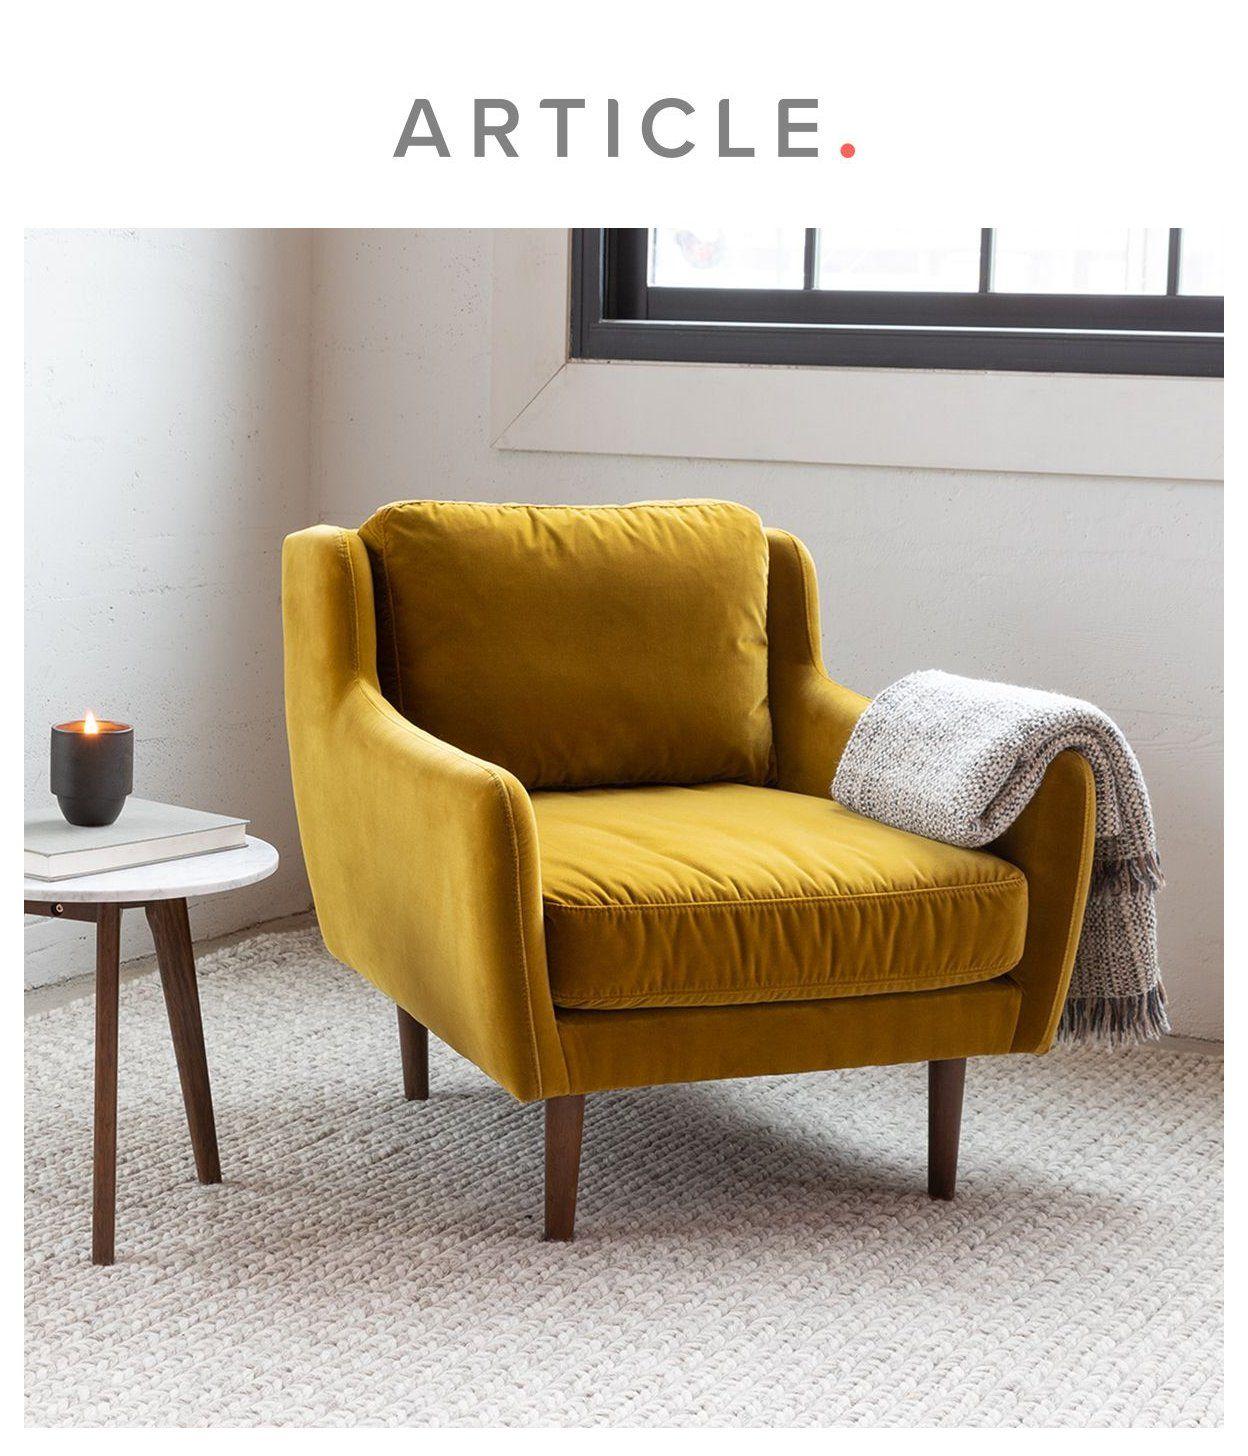 Matrix Yarrow Gold Chair Mustard Accent Chair Straight Off The Paris Runway Circa Yellow Chair Living Room Accent Chairs For Living Room Living Room Chairs